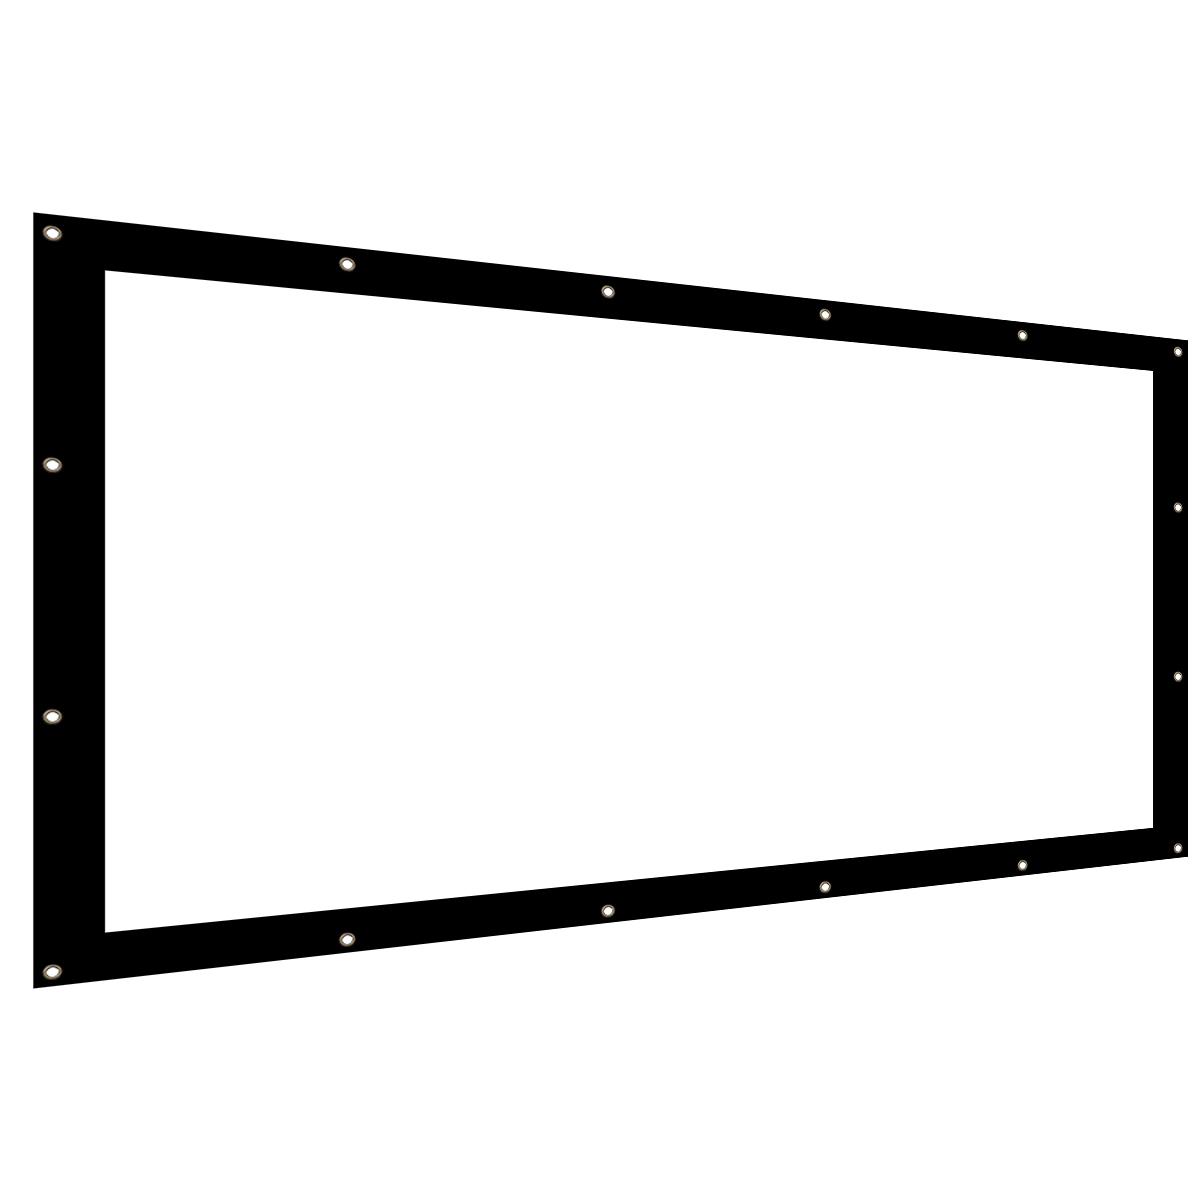 150inch 16 9 4 3 Hd Projector Display Screen Football Home